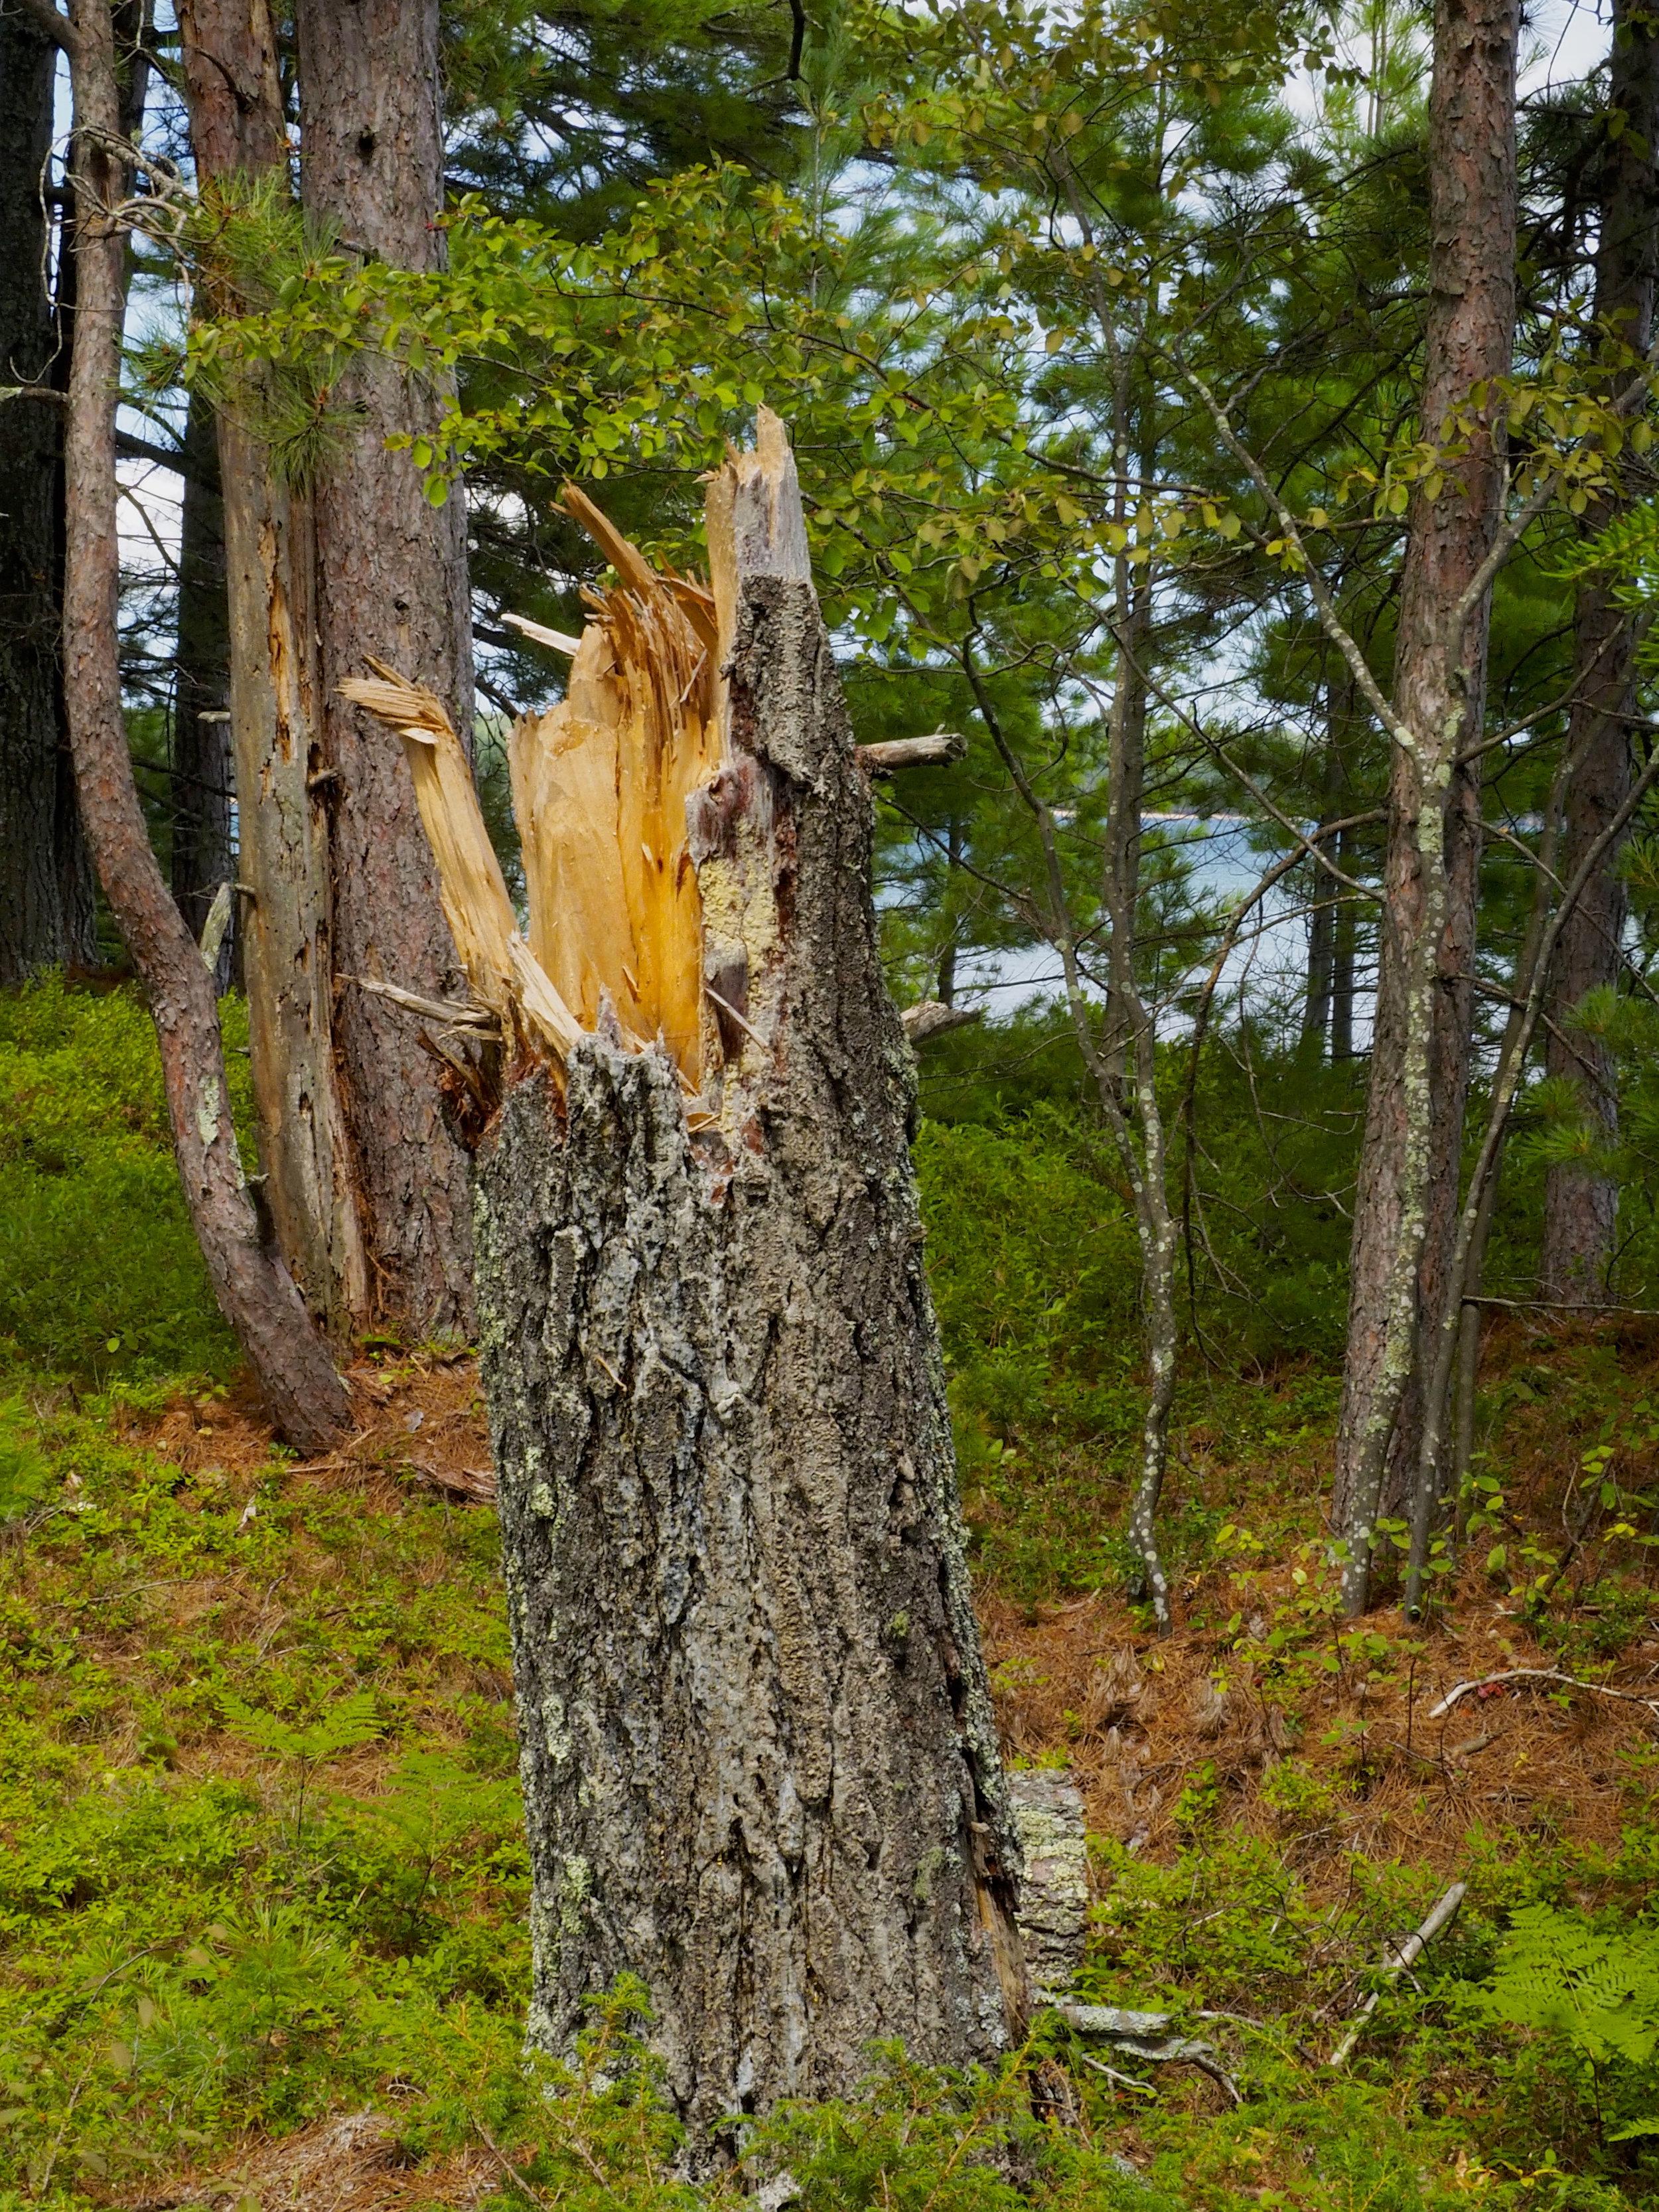 cindi_Madeline_NationalForest_Bog_spiritedtable_photo06.jpg